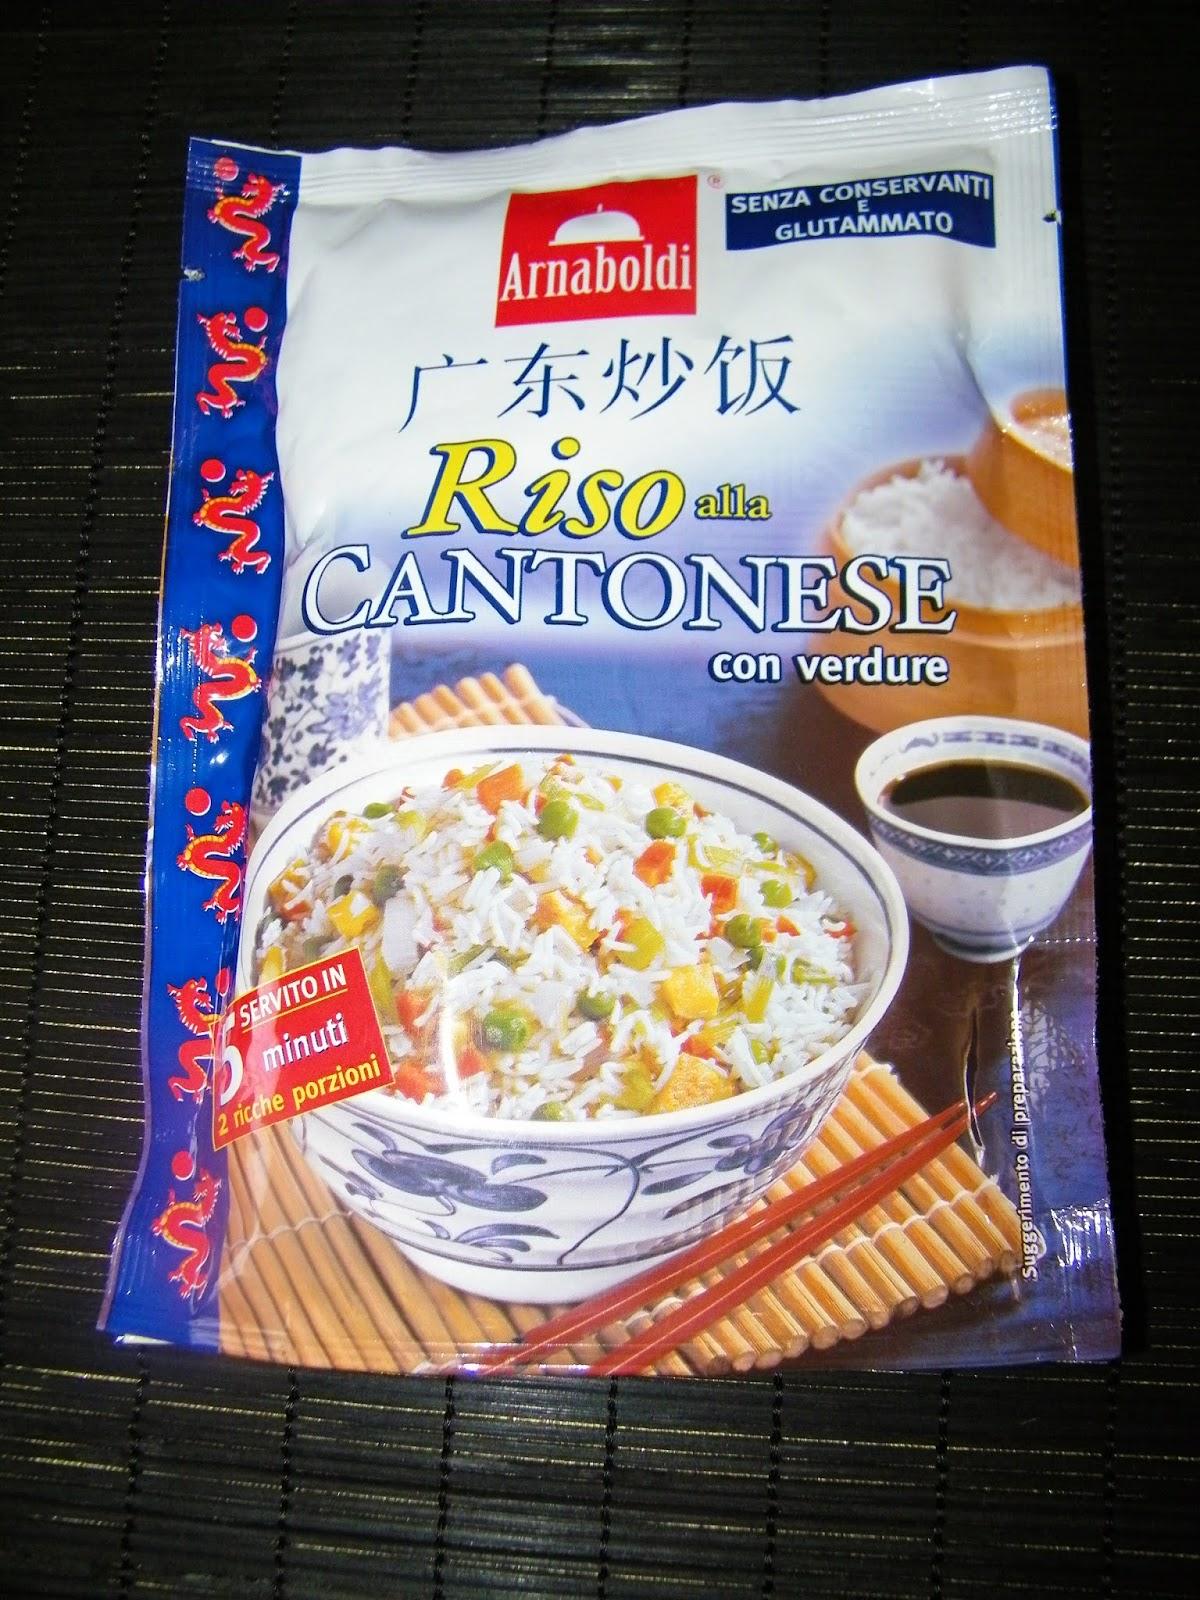 arnaboldi , riso alla cantonese